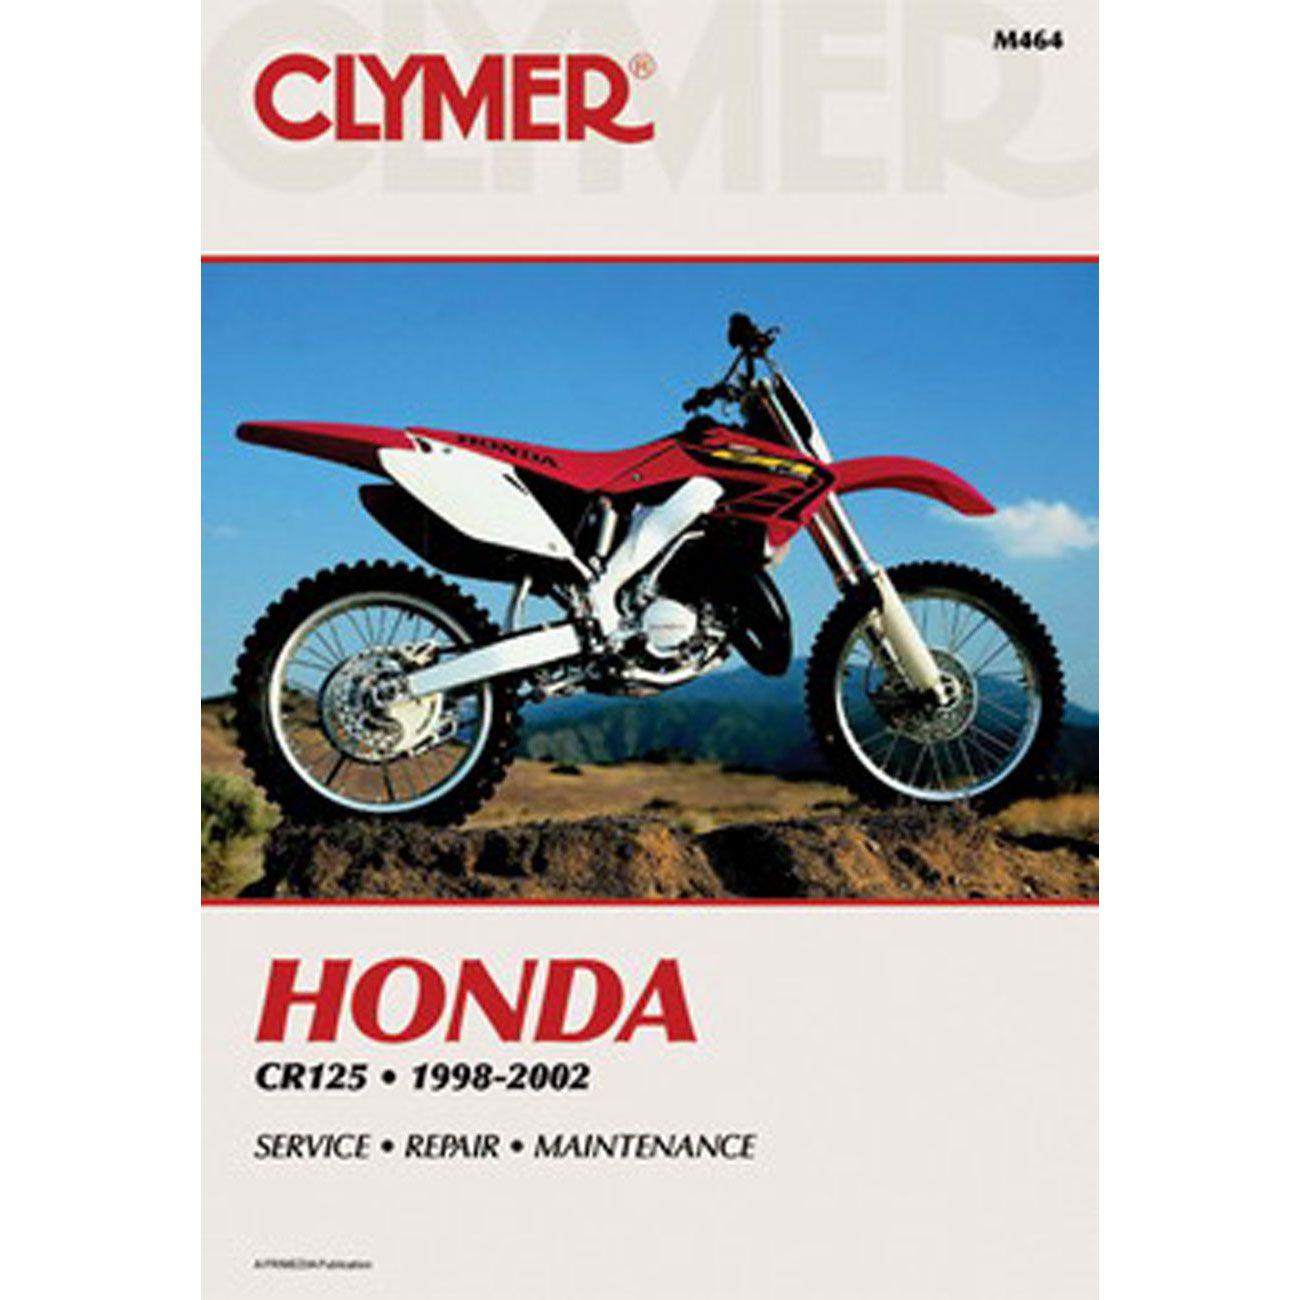 Clymer Dirt Bike Manual - Honda CR125 - Chaparral Motorsports